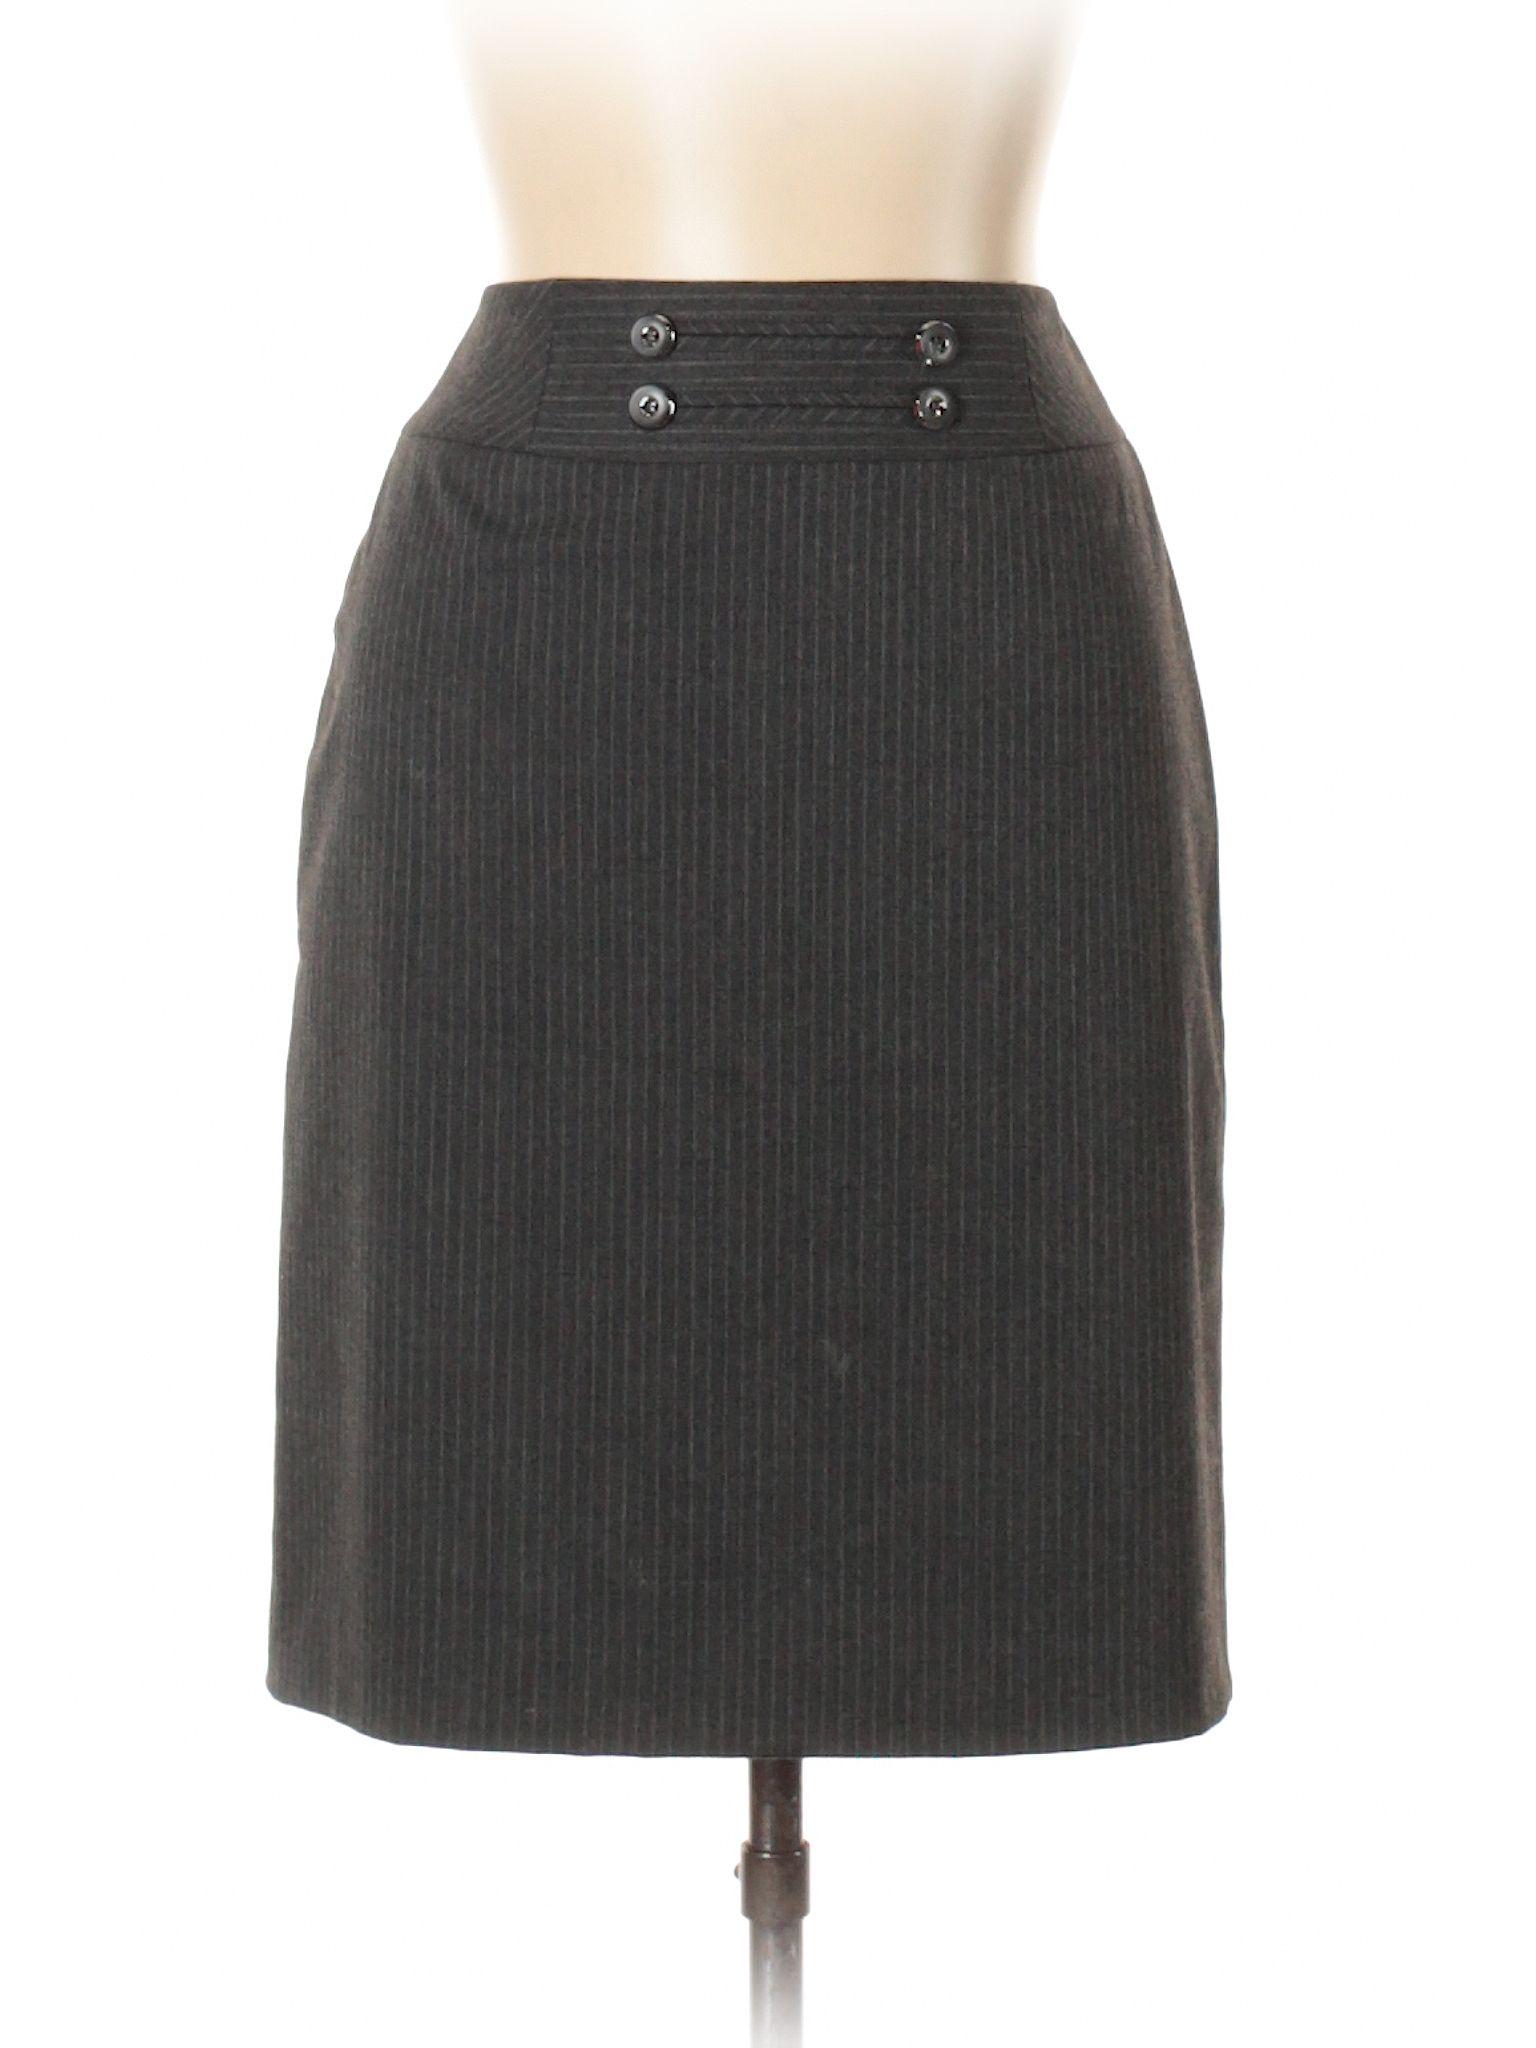 65122cc188 Antonio Melani Casual Skirt: Size 6.00 Gray Women's Bottoms - $7.99